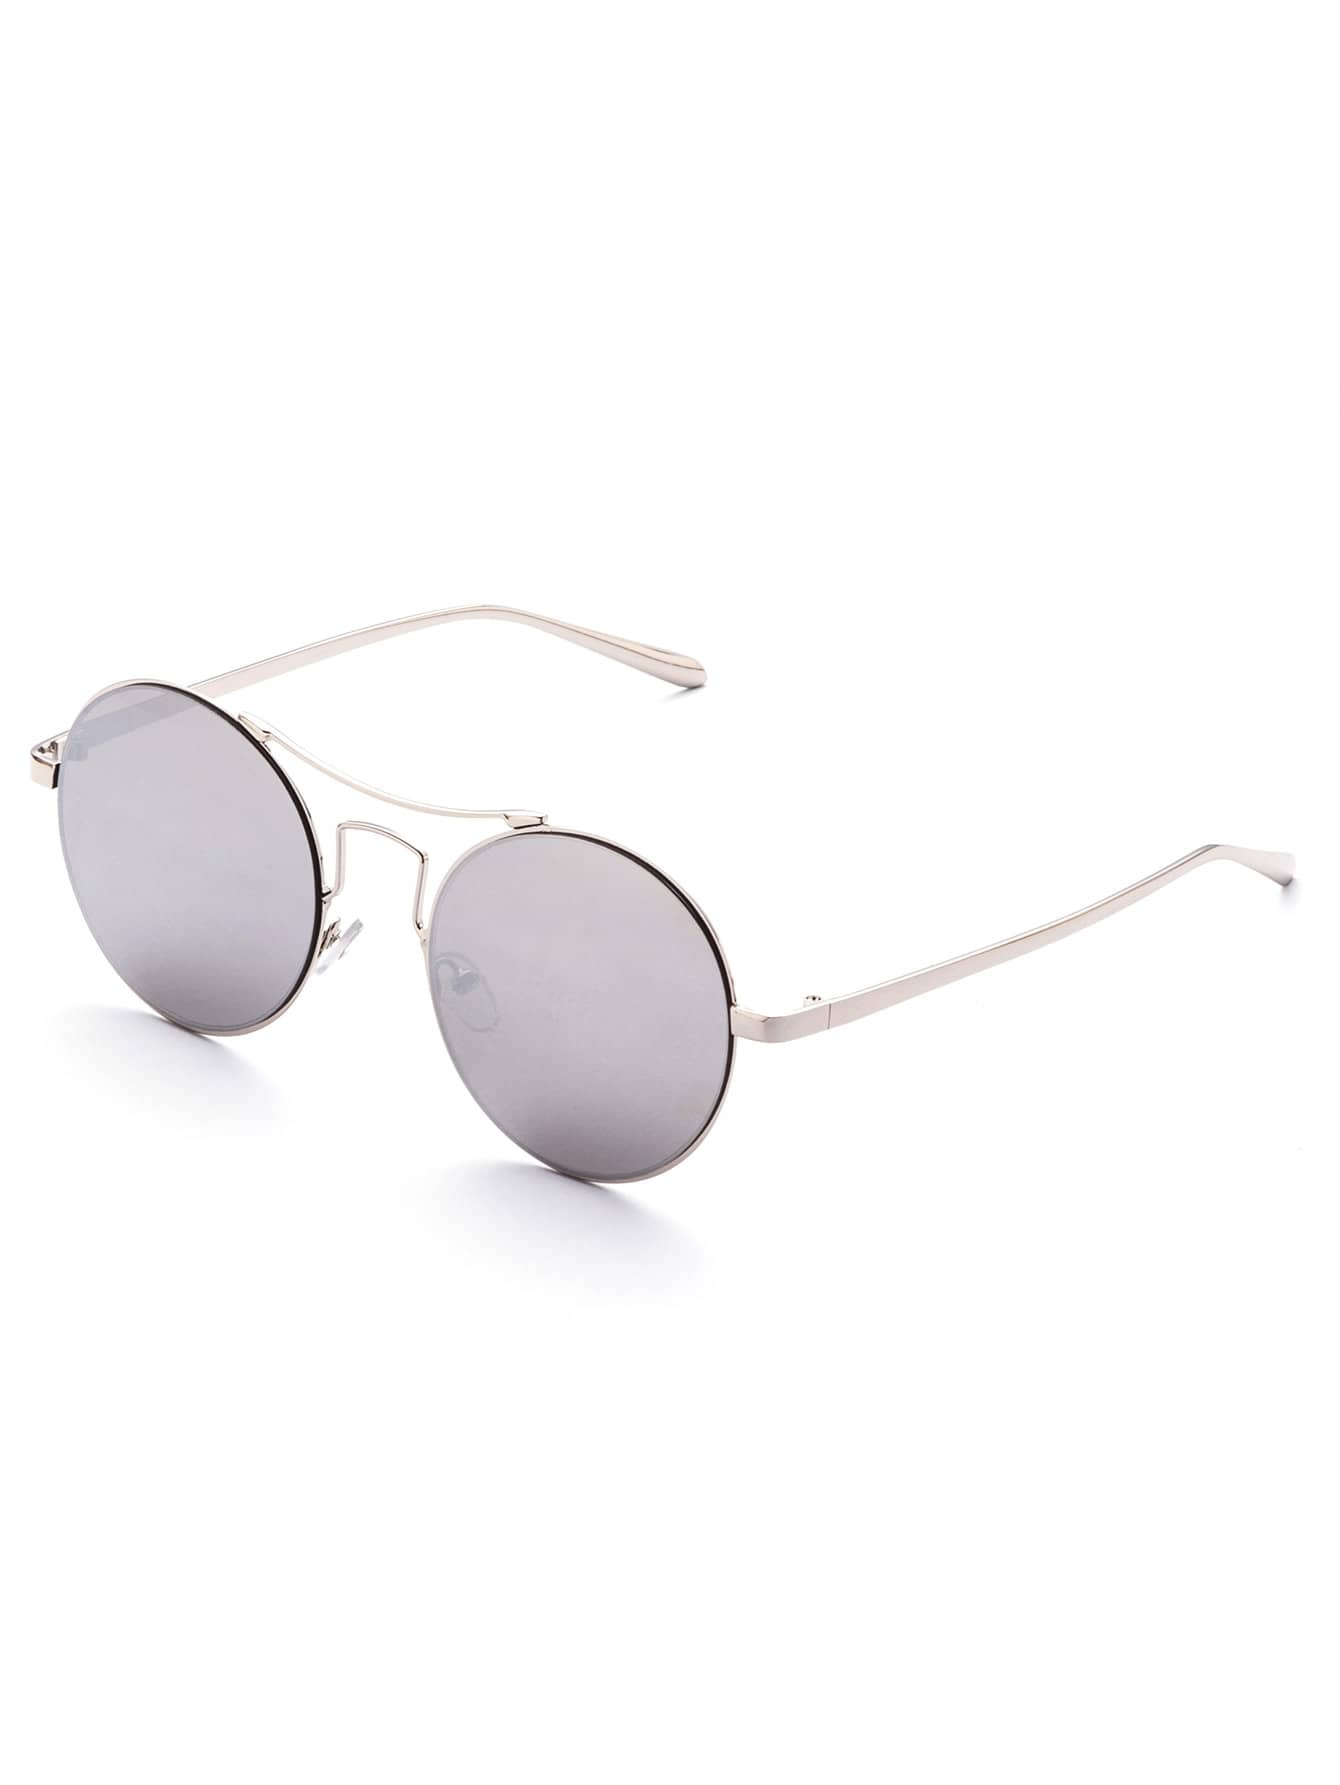 Silver Frame Mirrored Lens Round Retro SunglassesSilver Frame Mirrored Lens Round Retro Sunglasses<br><br>color: Silver<br>size: None